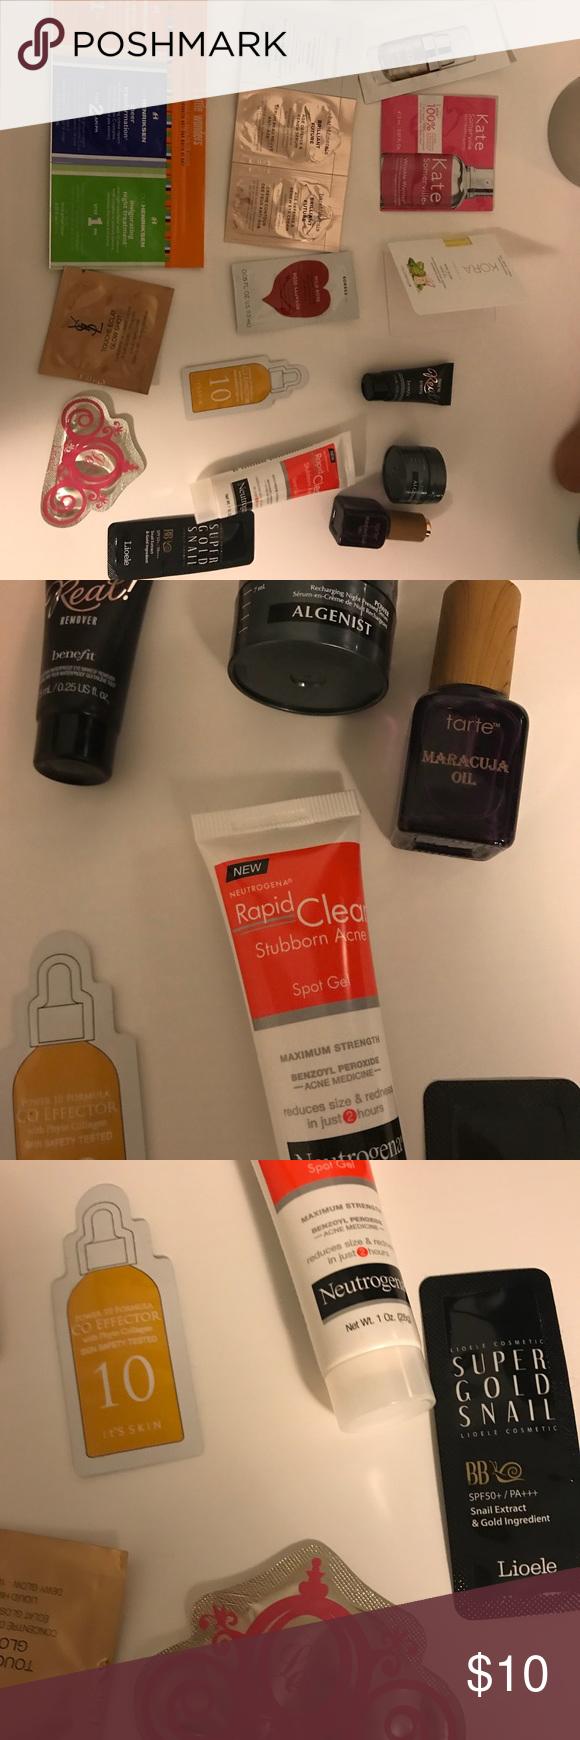 Sephora samples!! Sephora, Make up remover, Maracuja oil